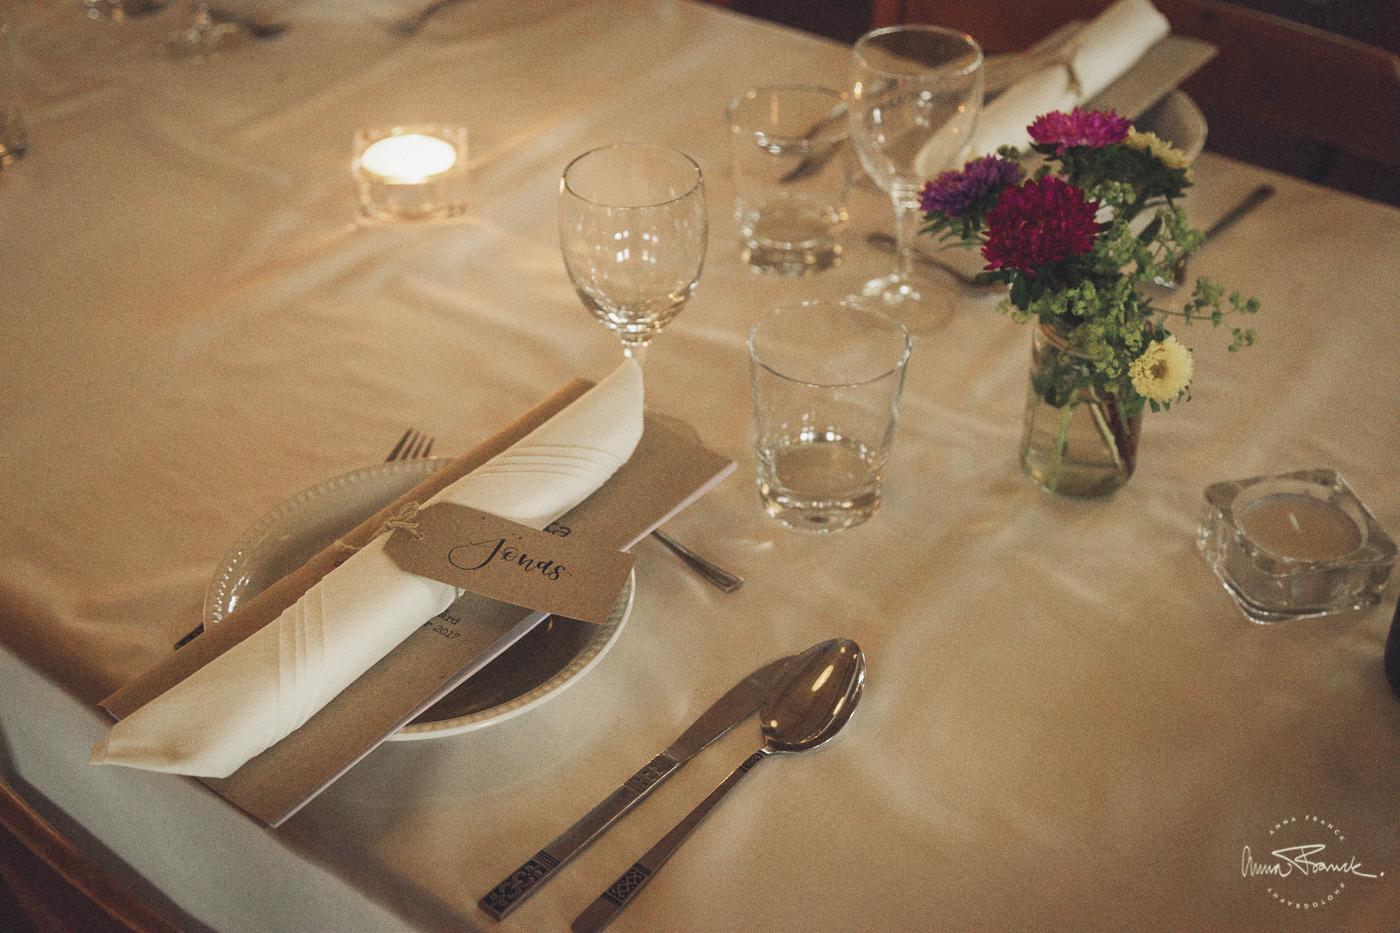 anna, franck, photography, wedding, bröllop, häät, hääkuvaus, bröllopsfotograf, weddingphotographer, stockholm, pargas, porträttfotograf, valokuvaaja, turku, natural, onlocation, scandinavian, autumn, höstbröllop